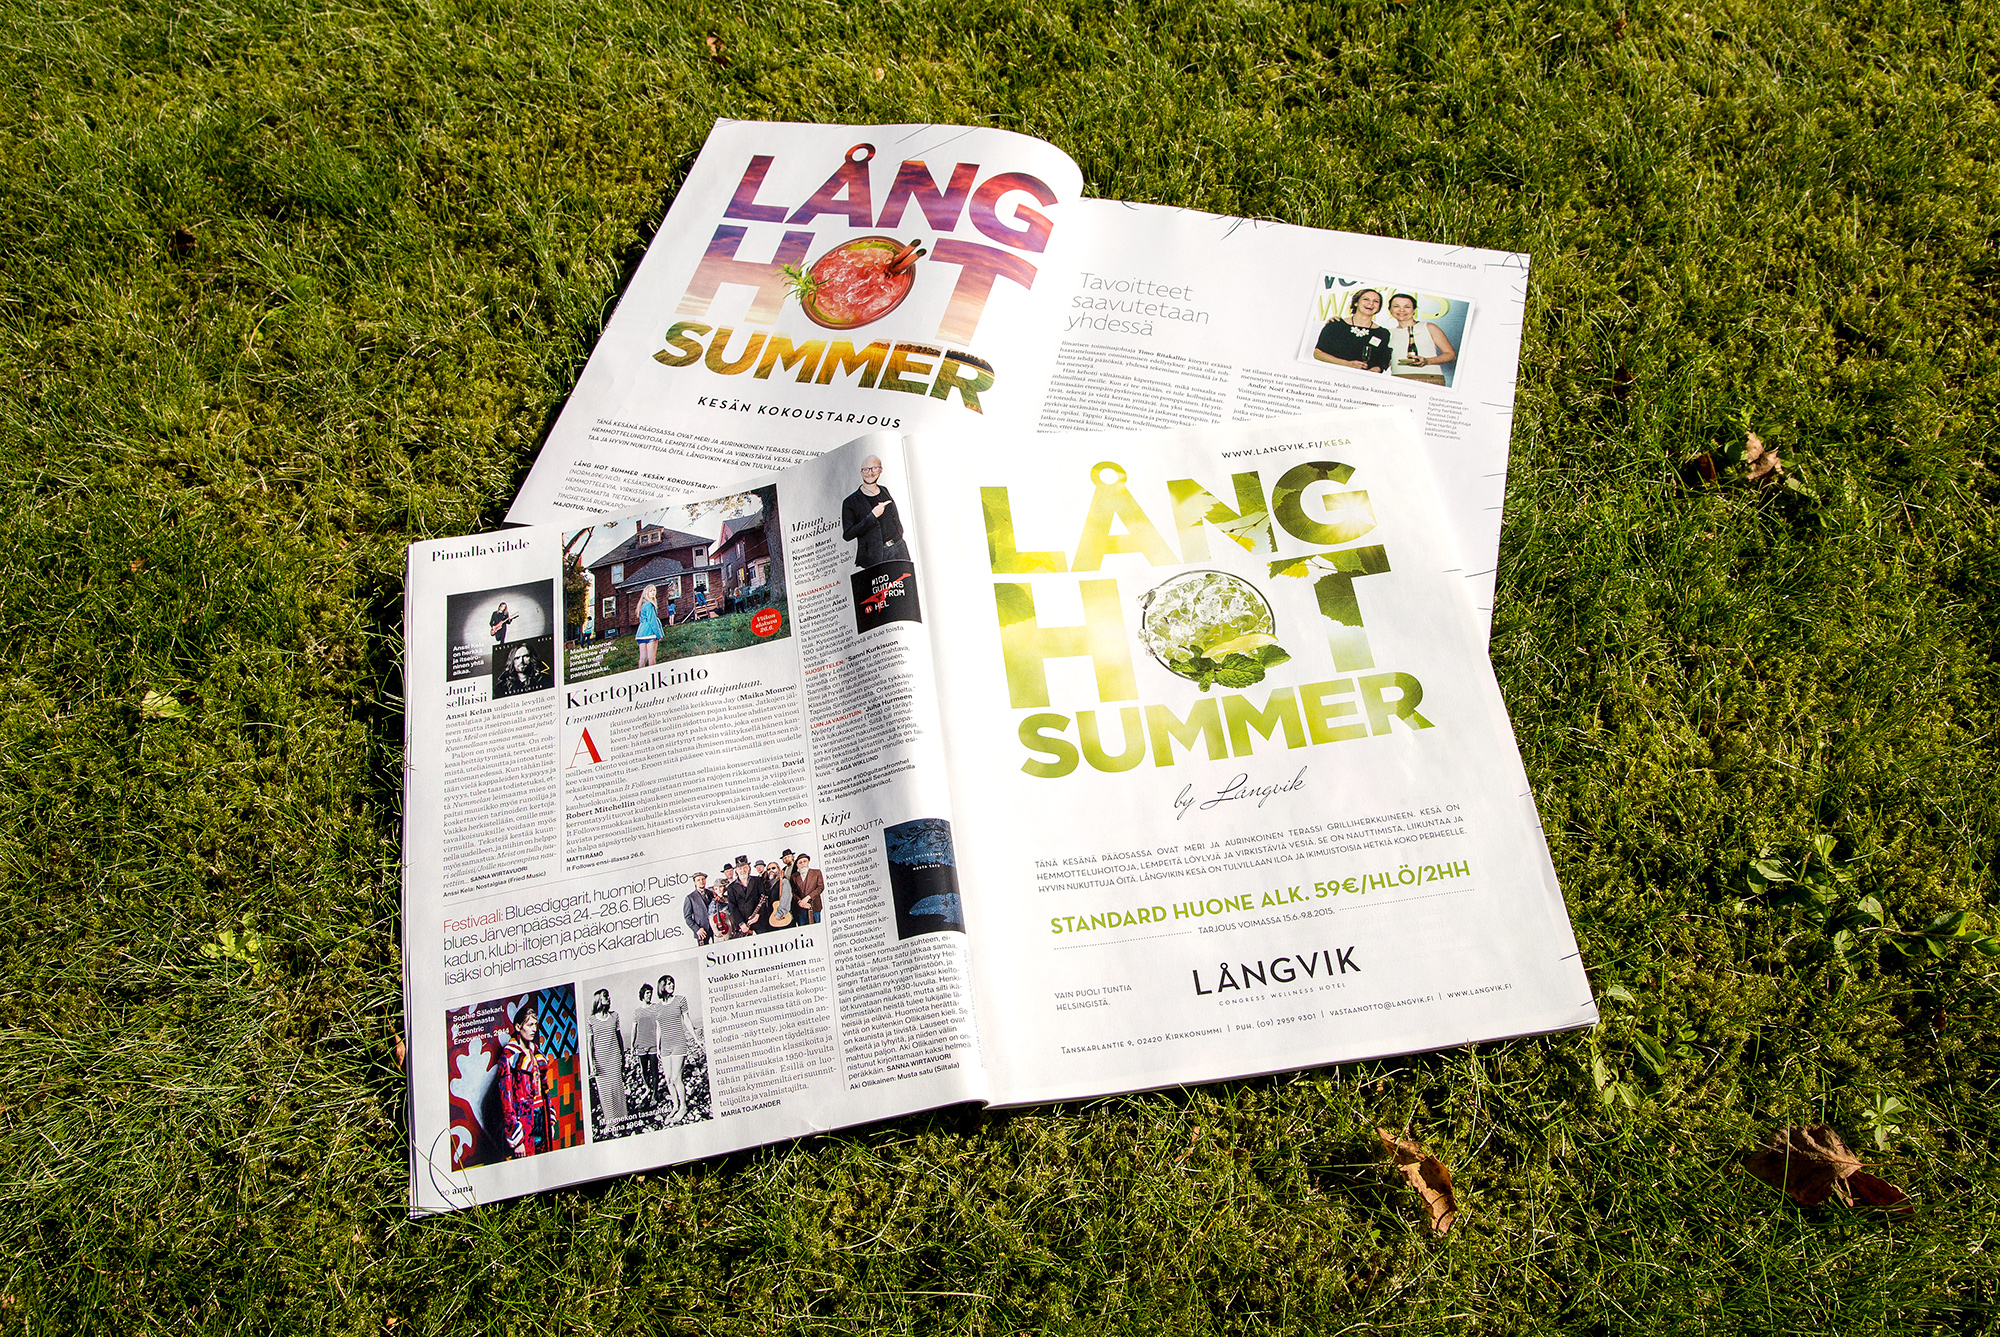 langvik_lhs_annaevento